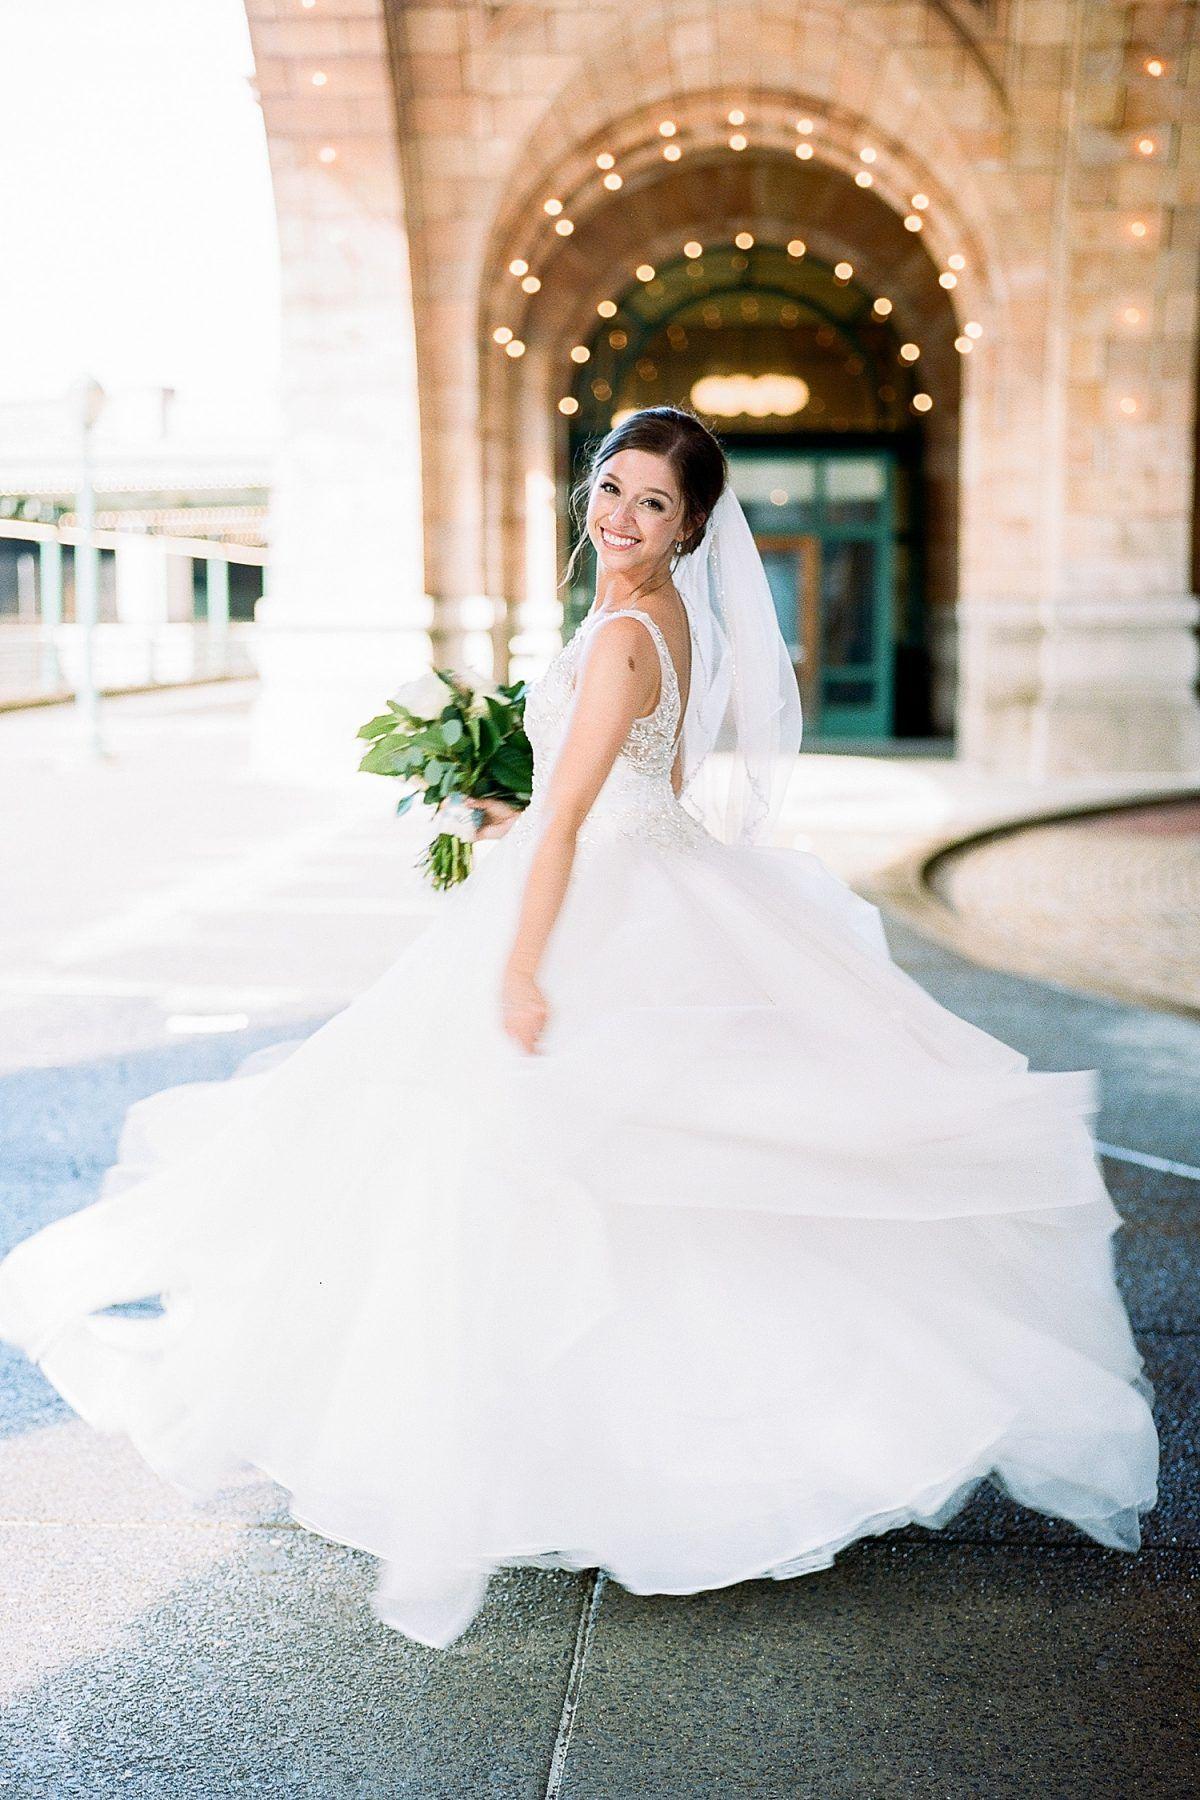 2019 S Most Beautiful Pittsburgh Wedding Dresses Wedding Dress Long Sleeve Wedding Dresses Romantic Sottero And Midgley Wedding Dresses